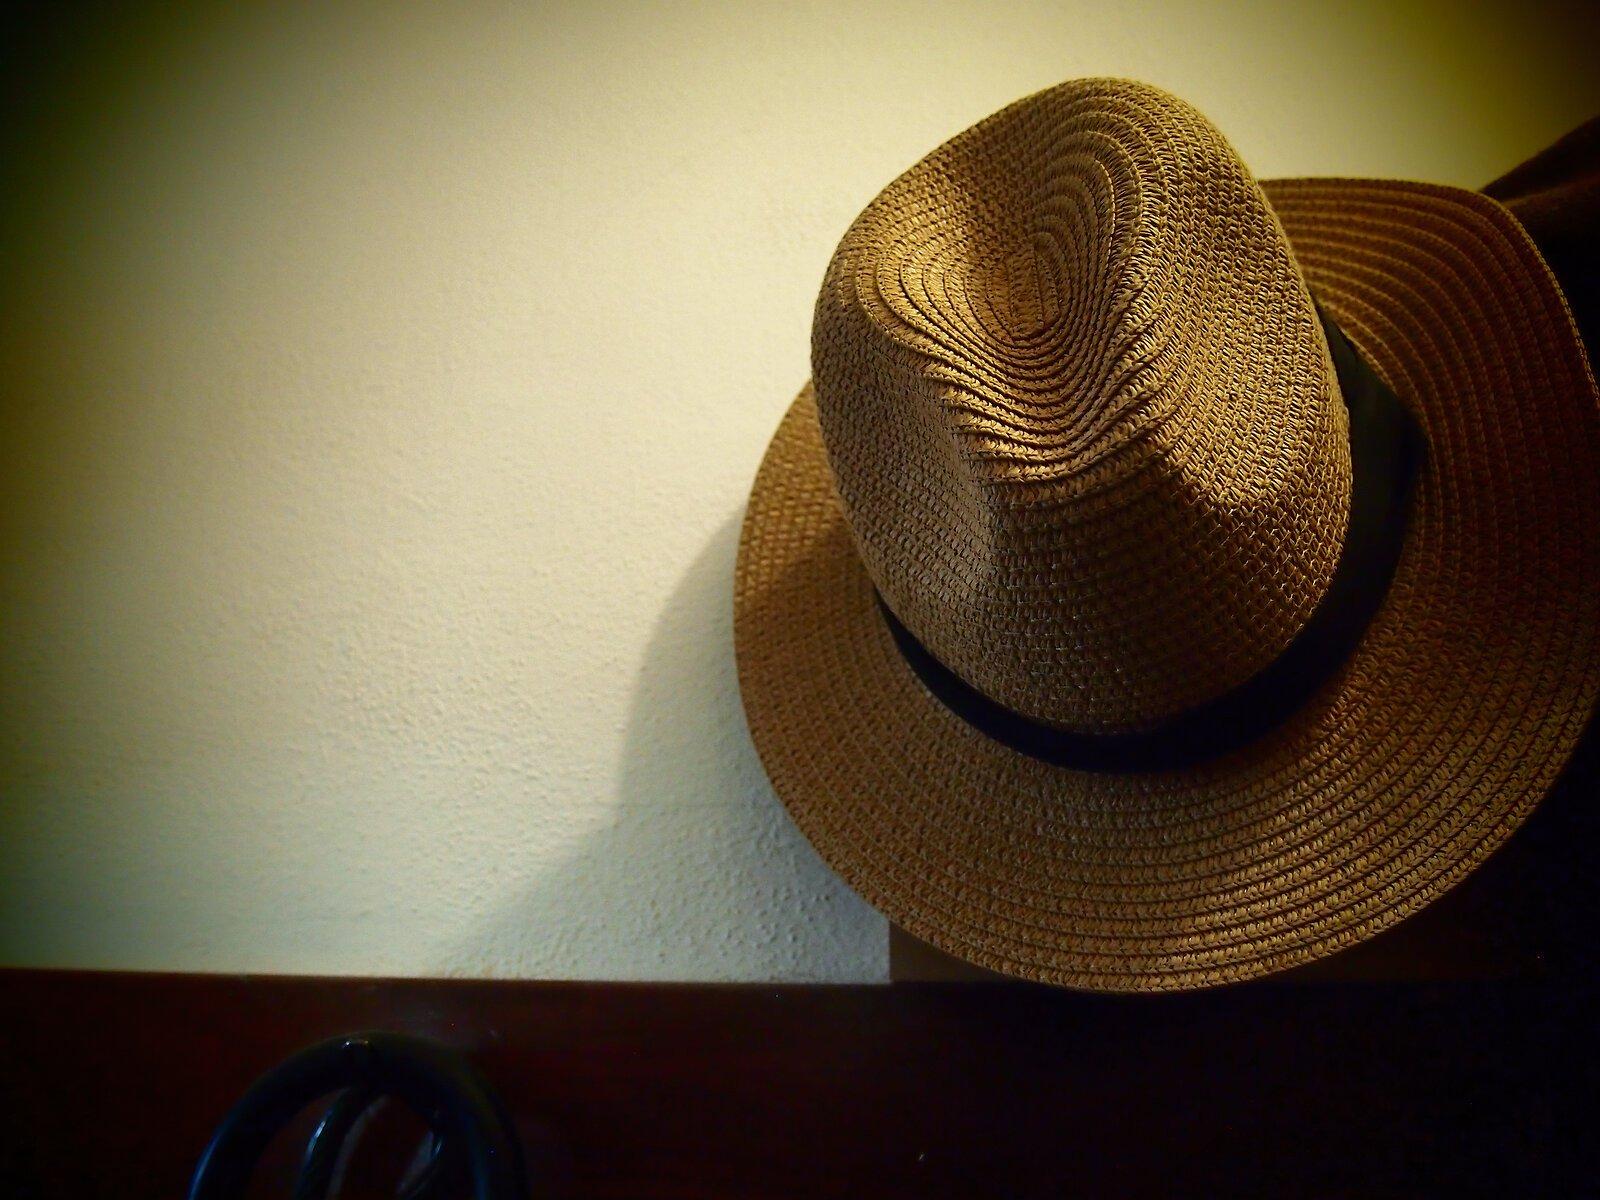 EP3_Oct25_Straw_hat.jpg